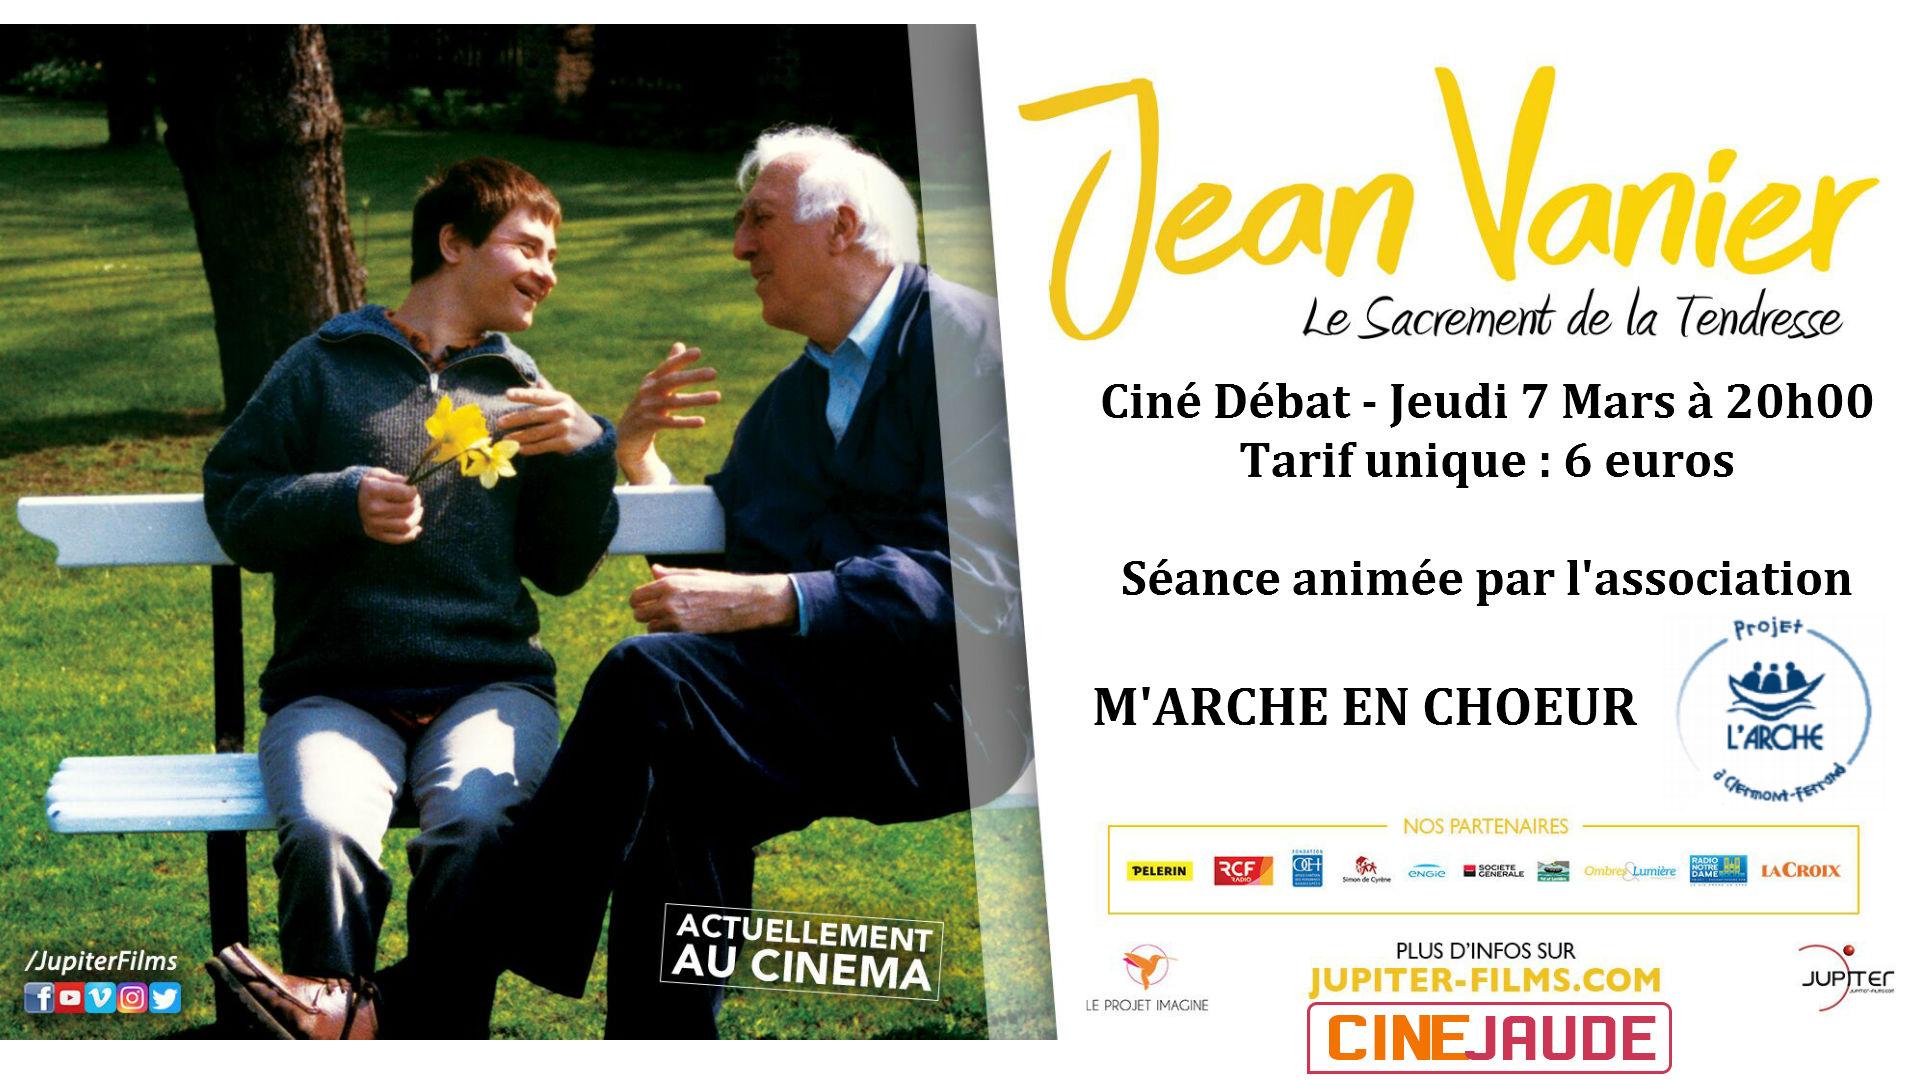 Jean vanier 1